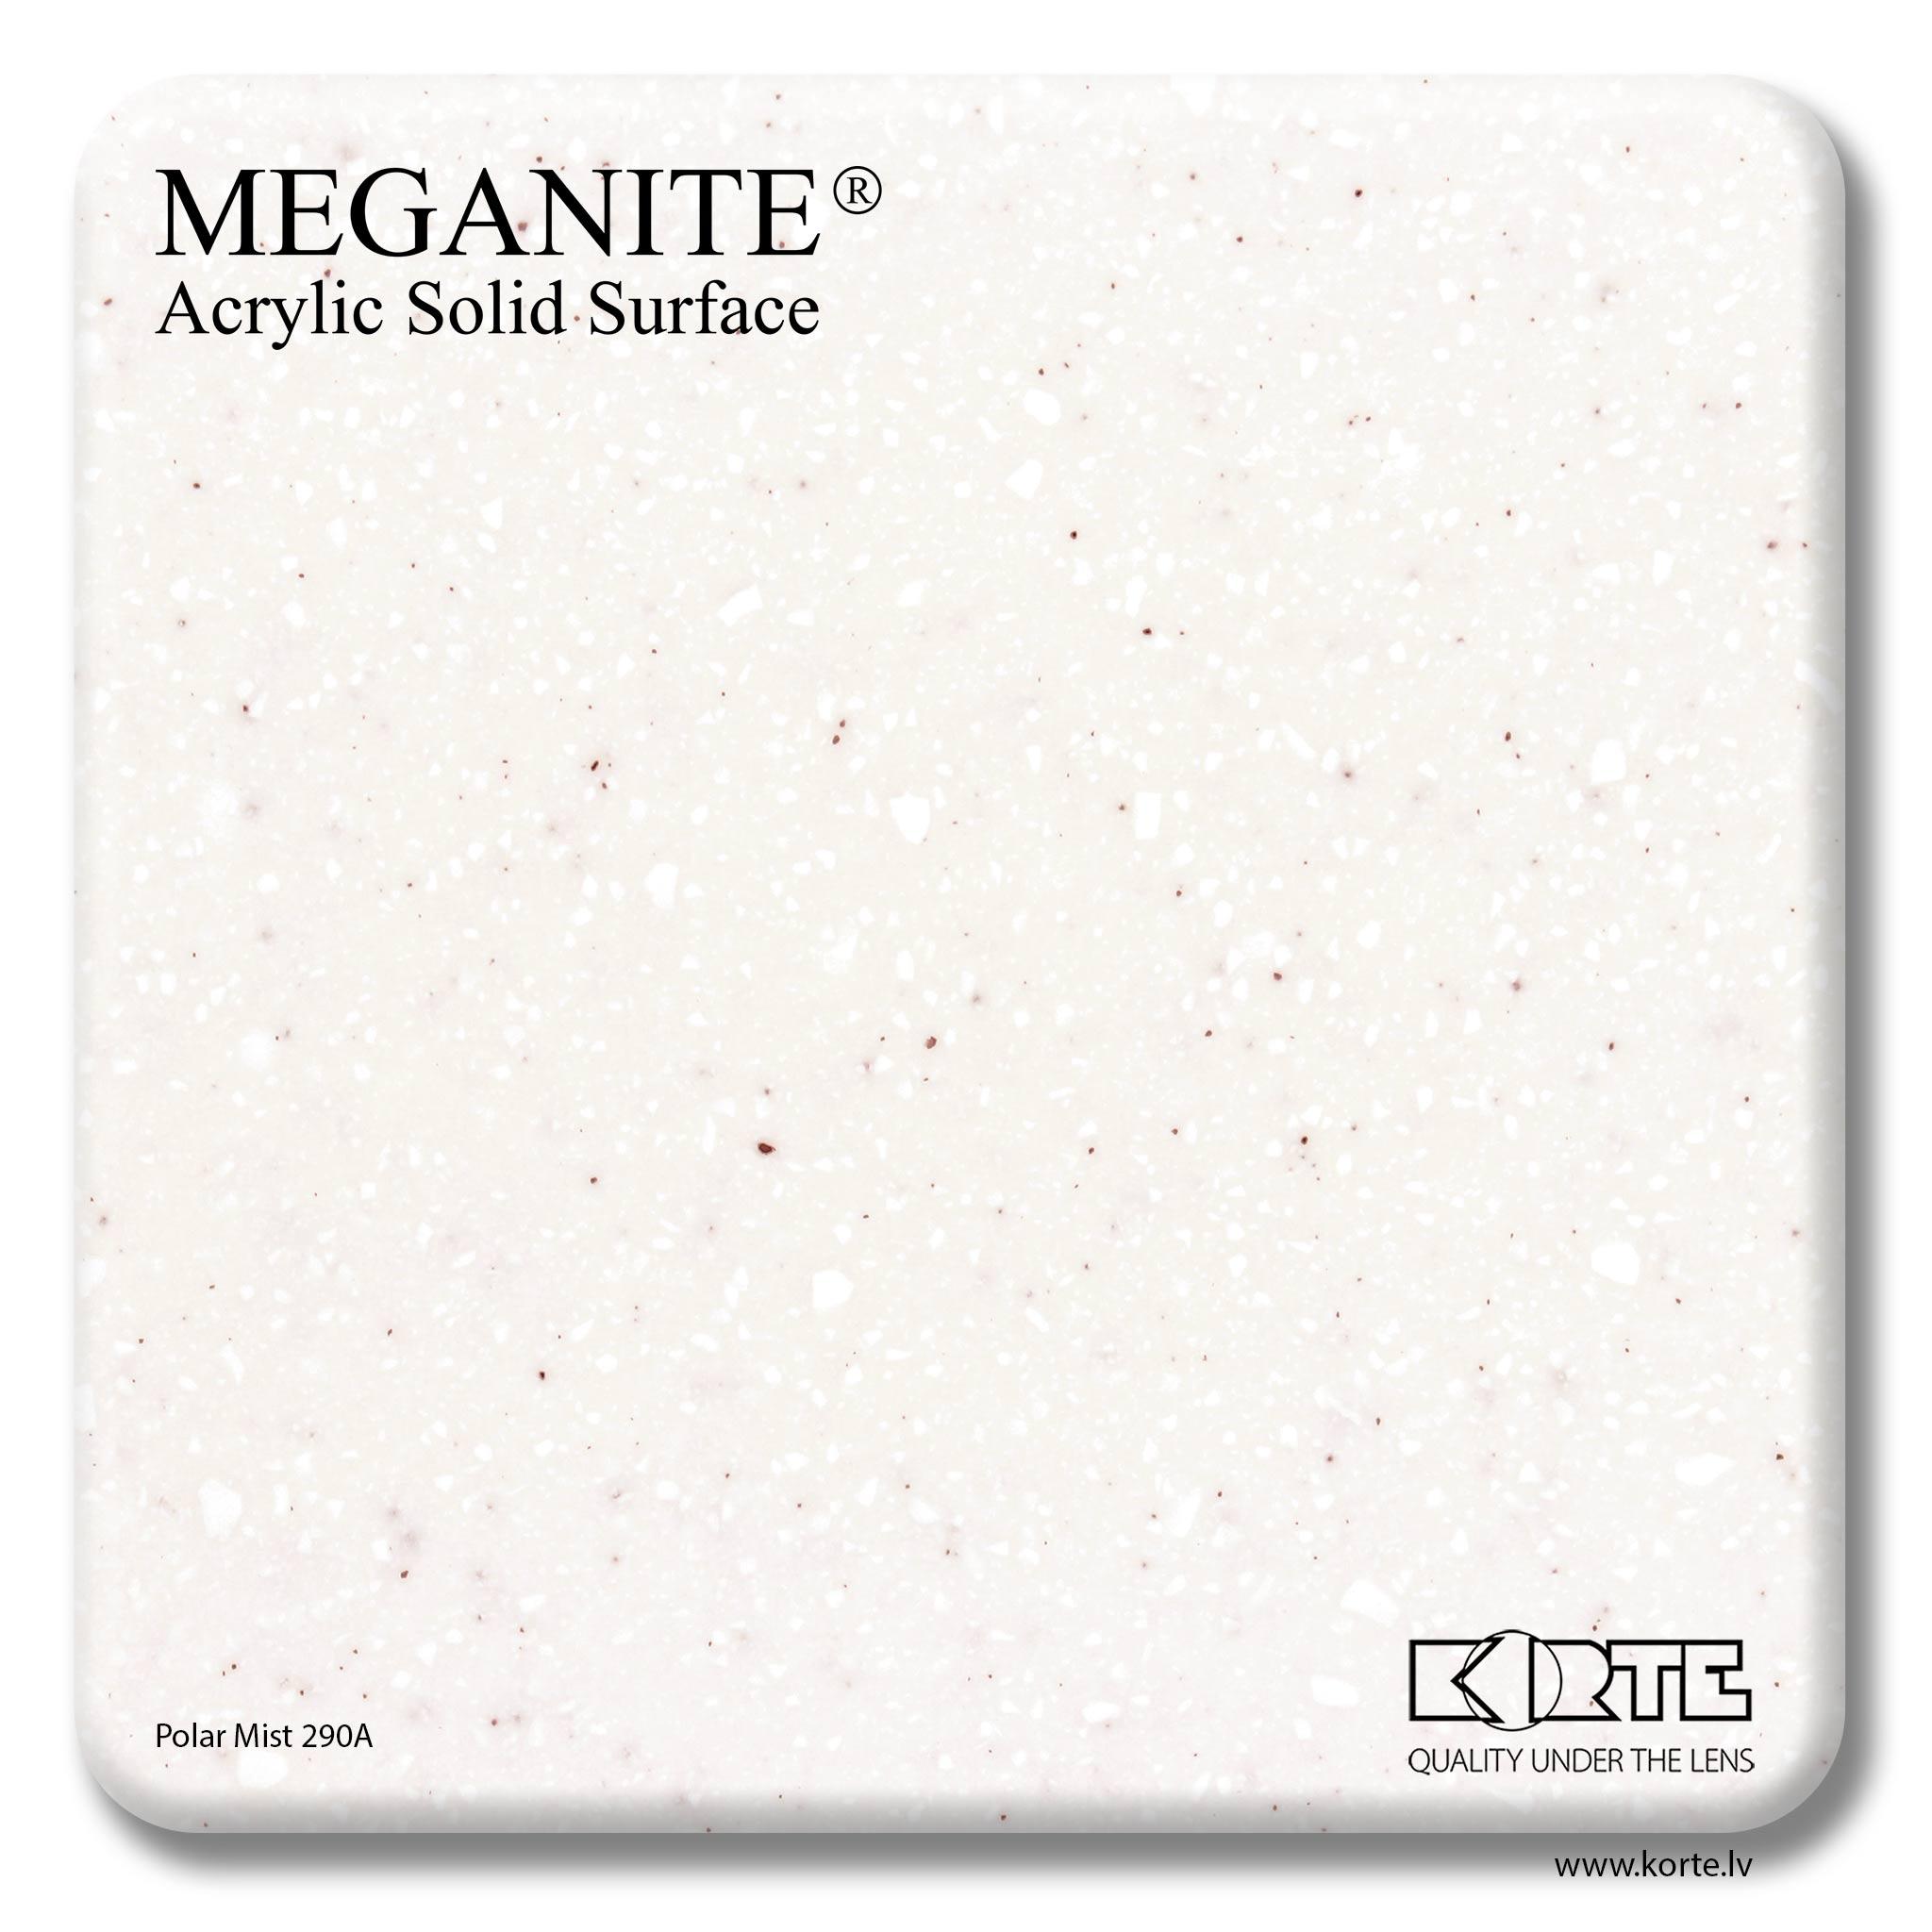 Meganite Polar Mist 290A